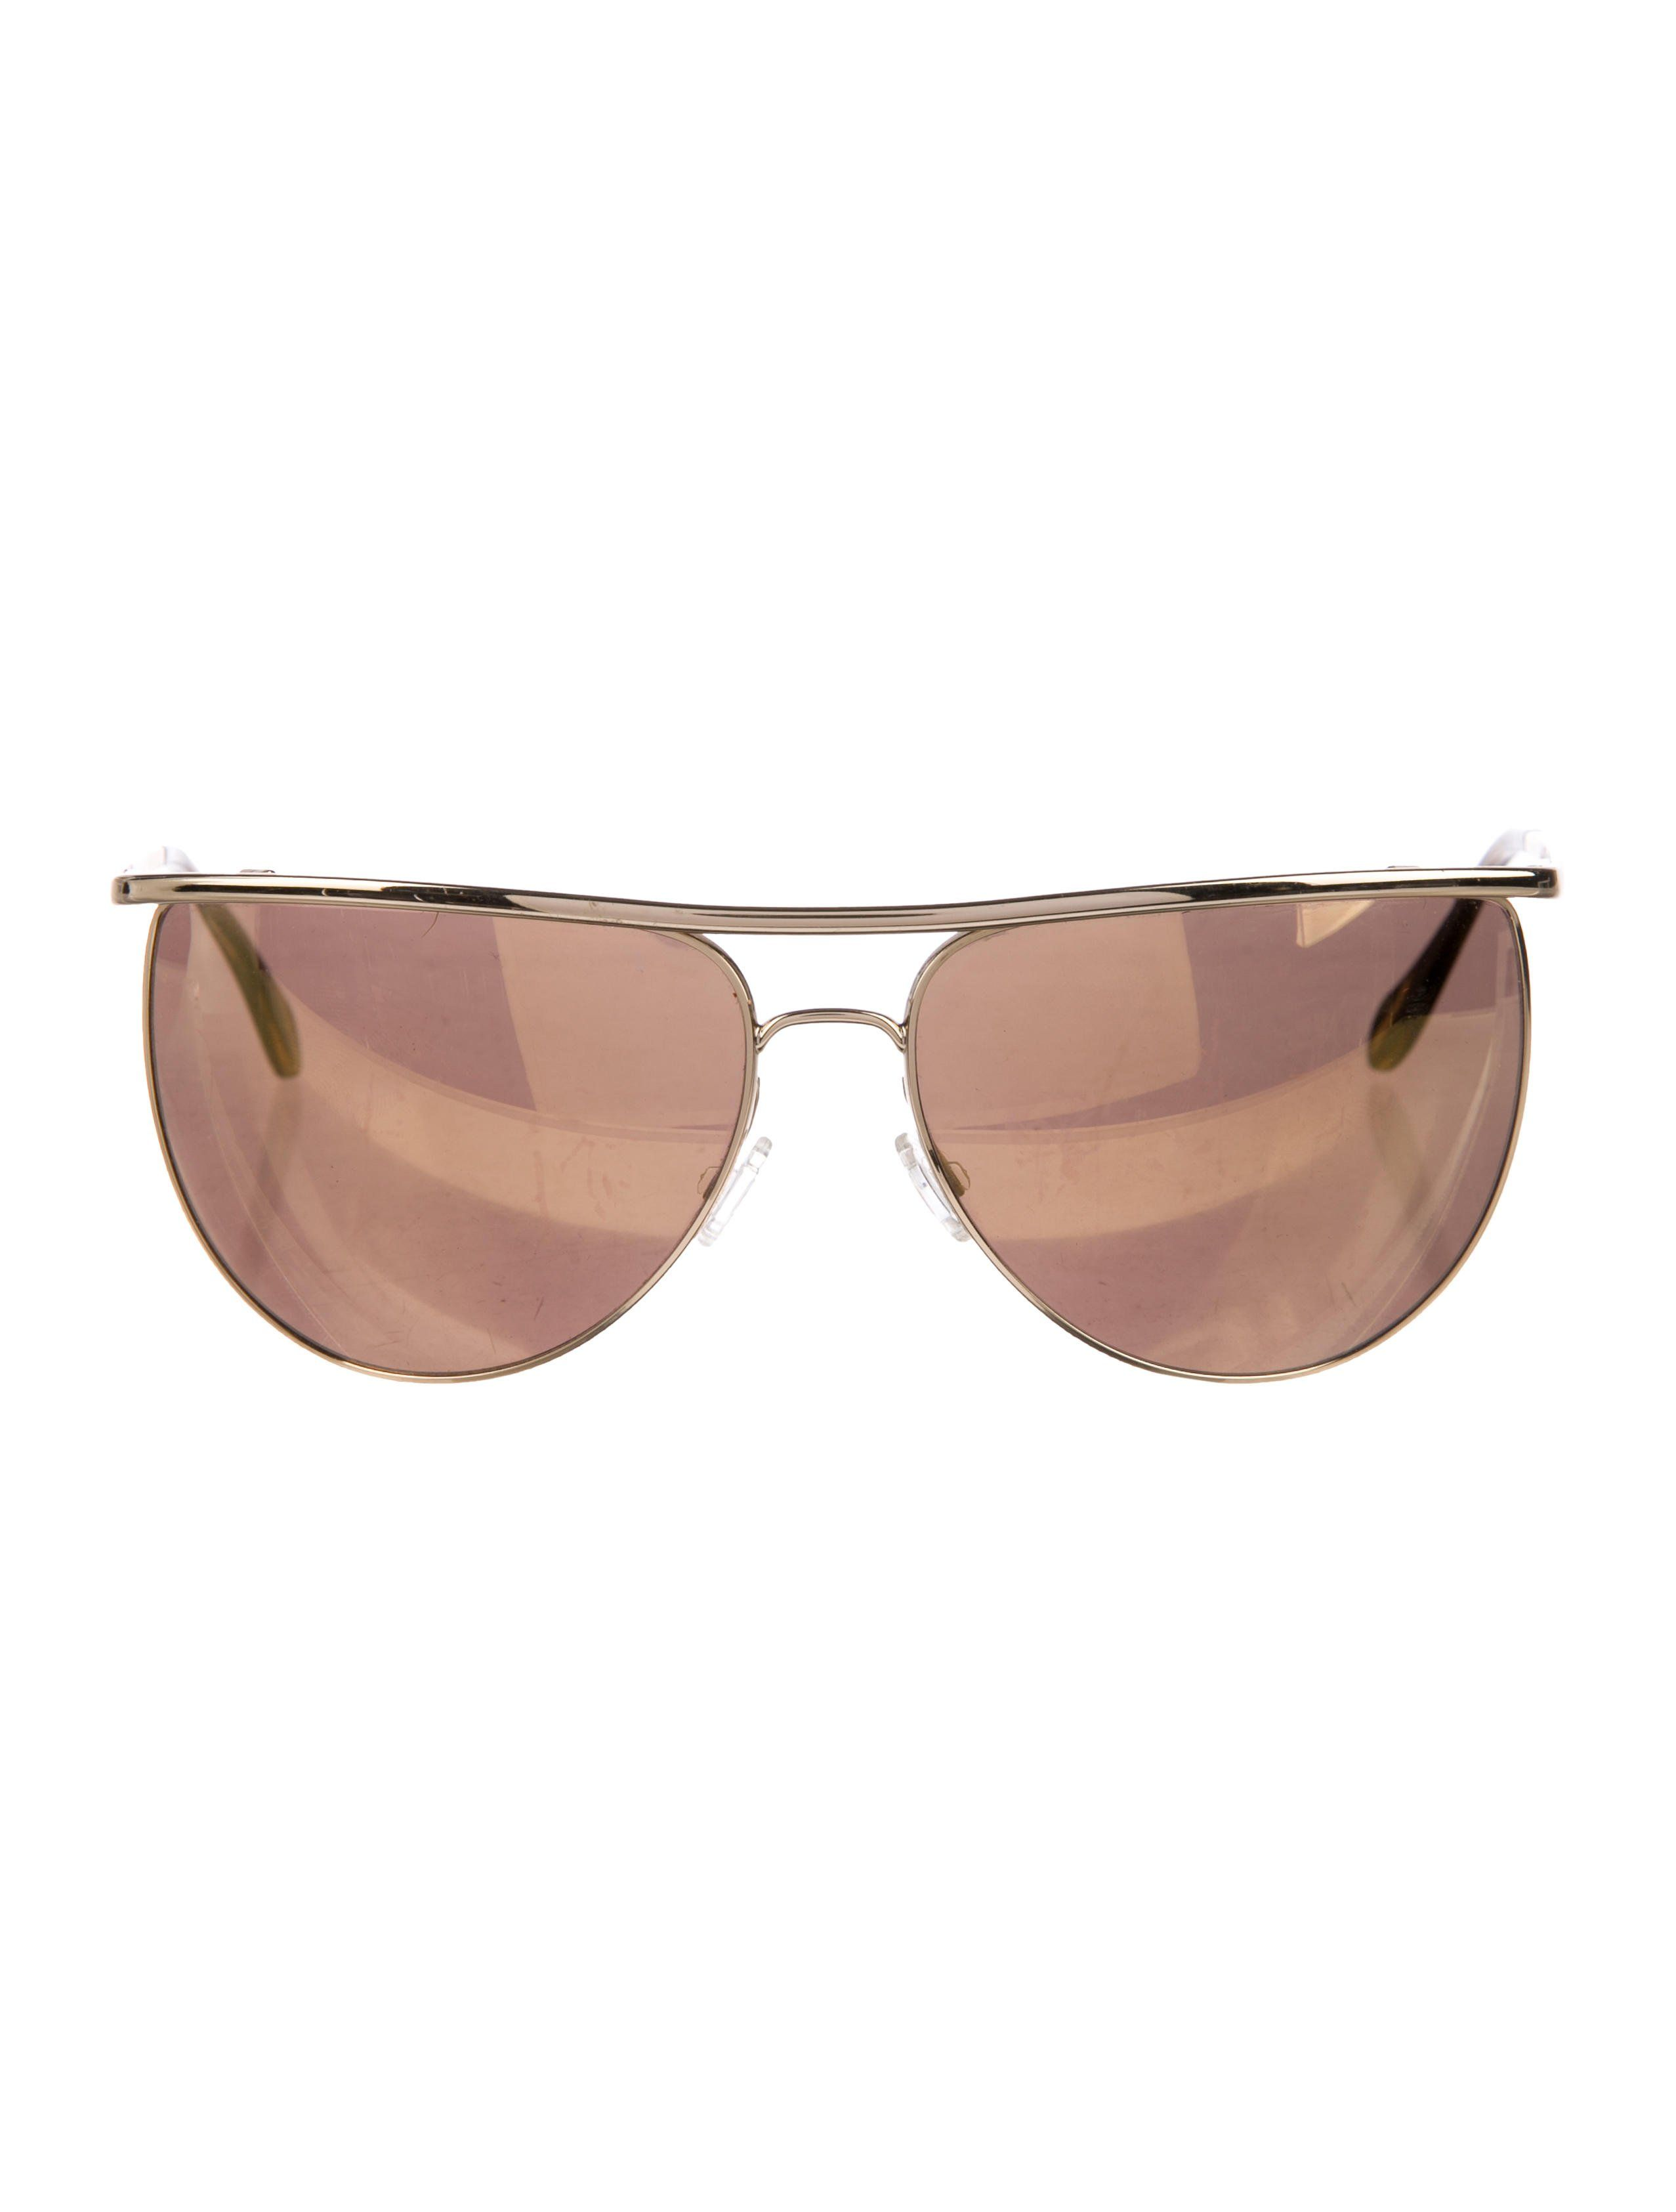 4e44e2128 Men's gold-tone metal Balmain for Oliver Peoples aviator sunglasses with  reflective lenses.